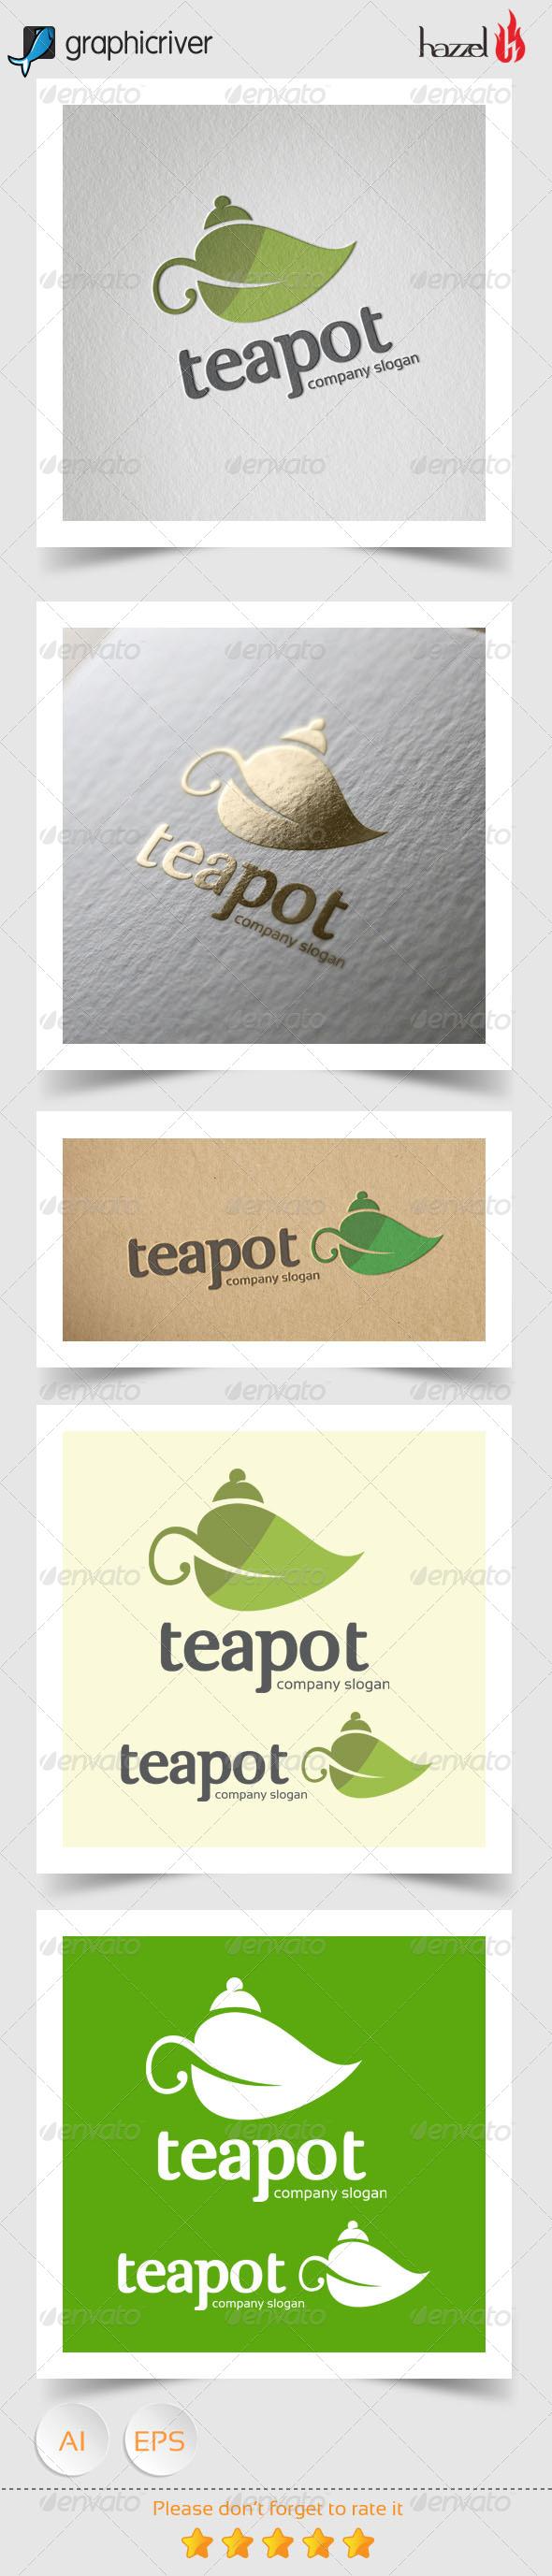 GraphicRiver Teapot Logo 8170912